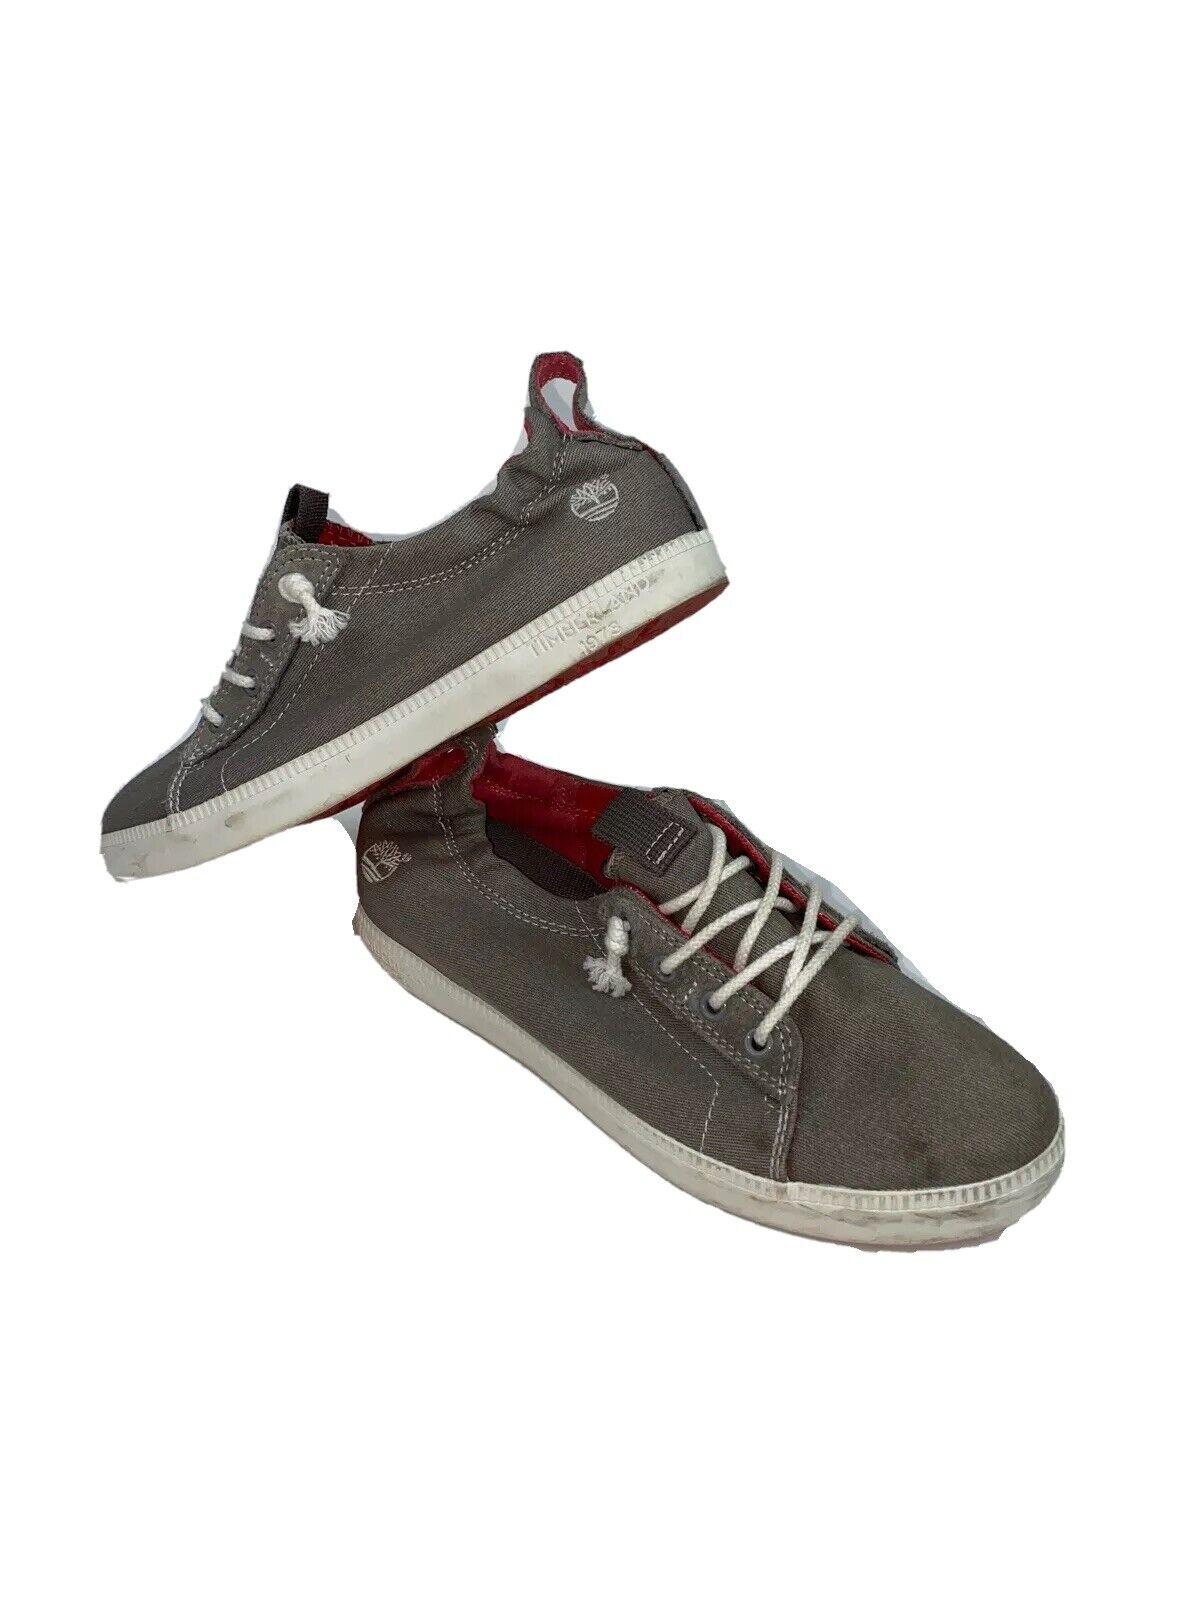 Timberland Women's Canvas Casual Shoe Sneaker Ortholite Gray Travel Walking SZ 7